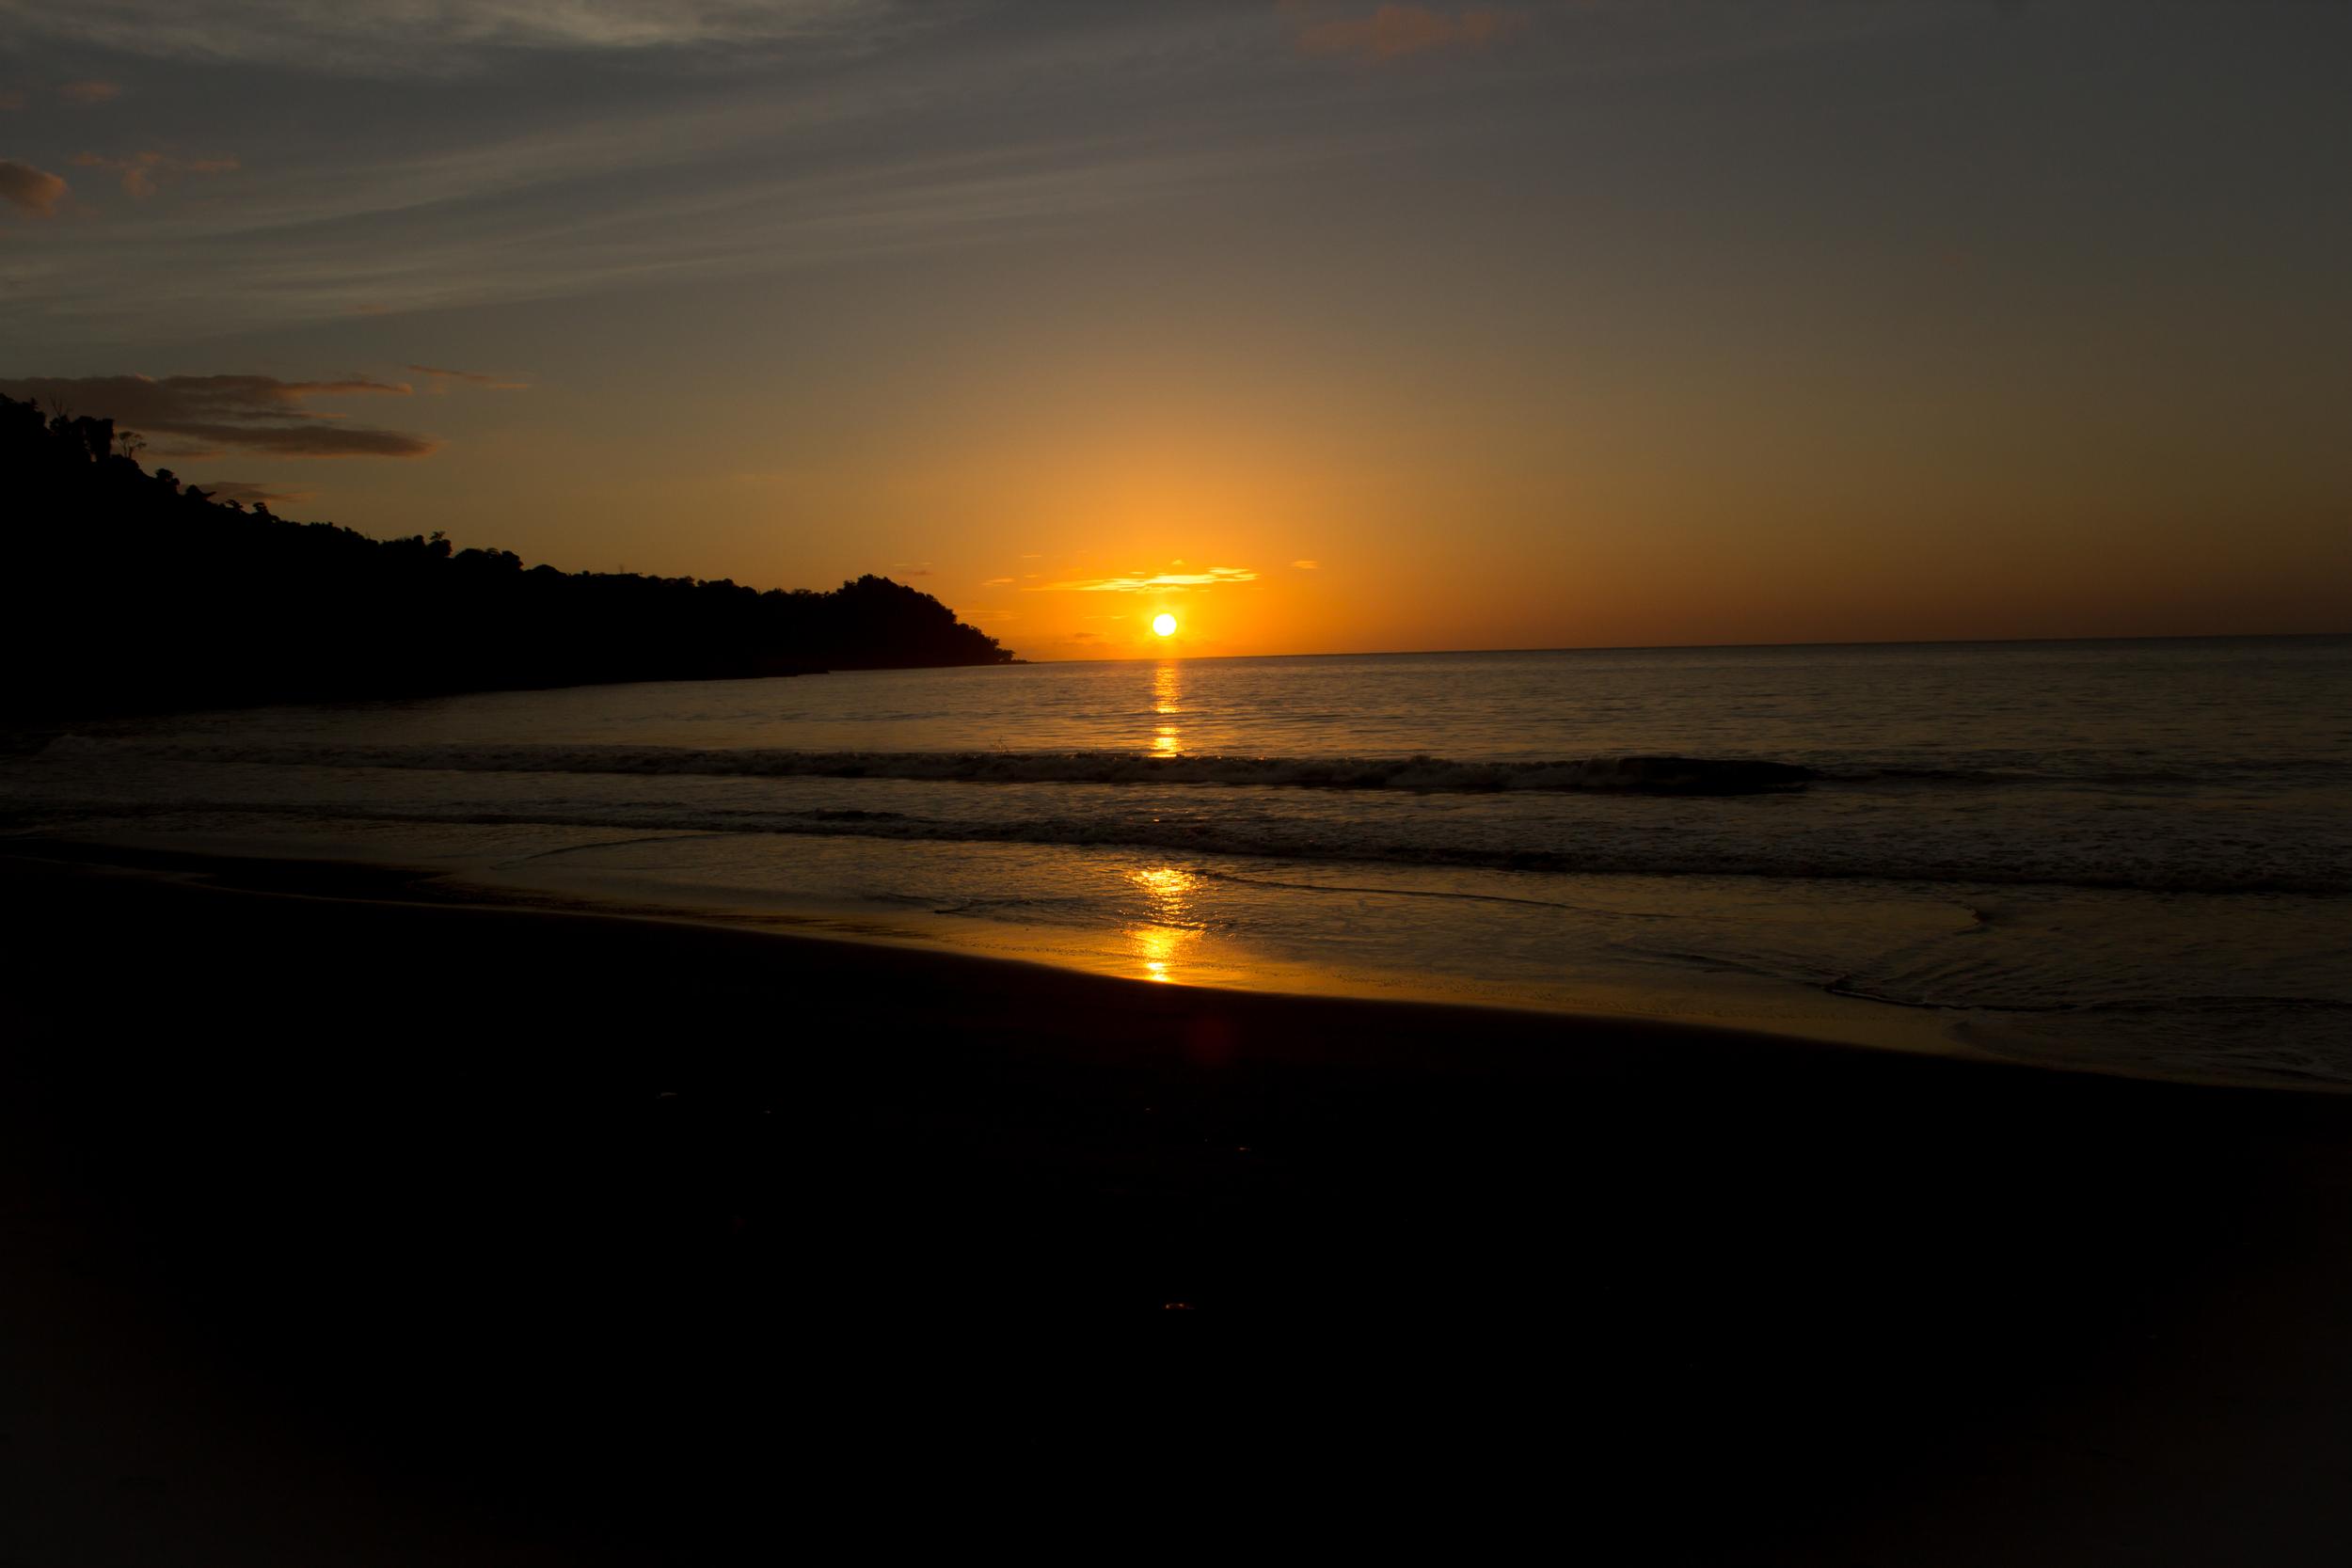 costarica2015-9772.jpg